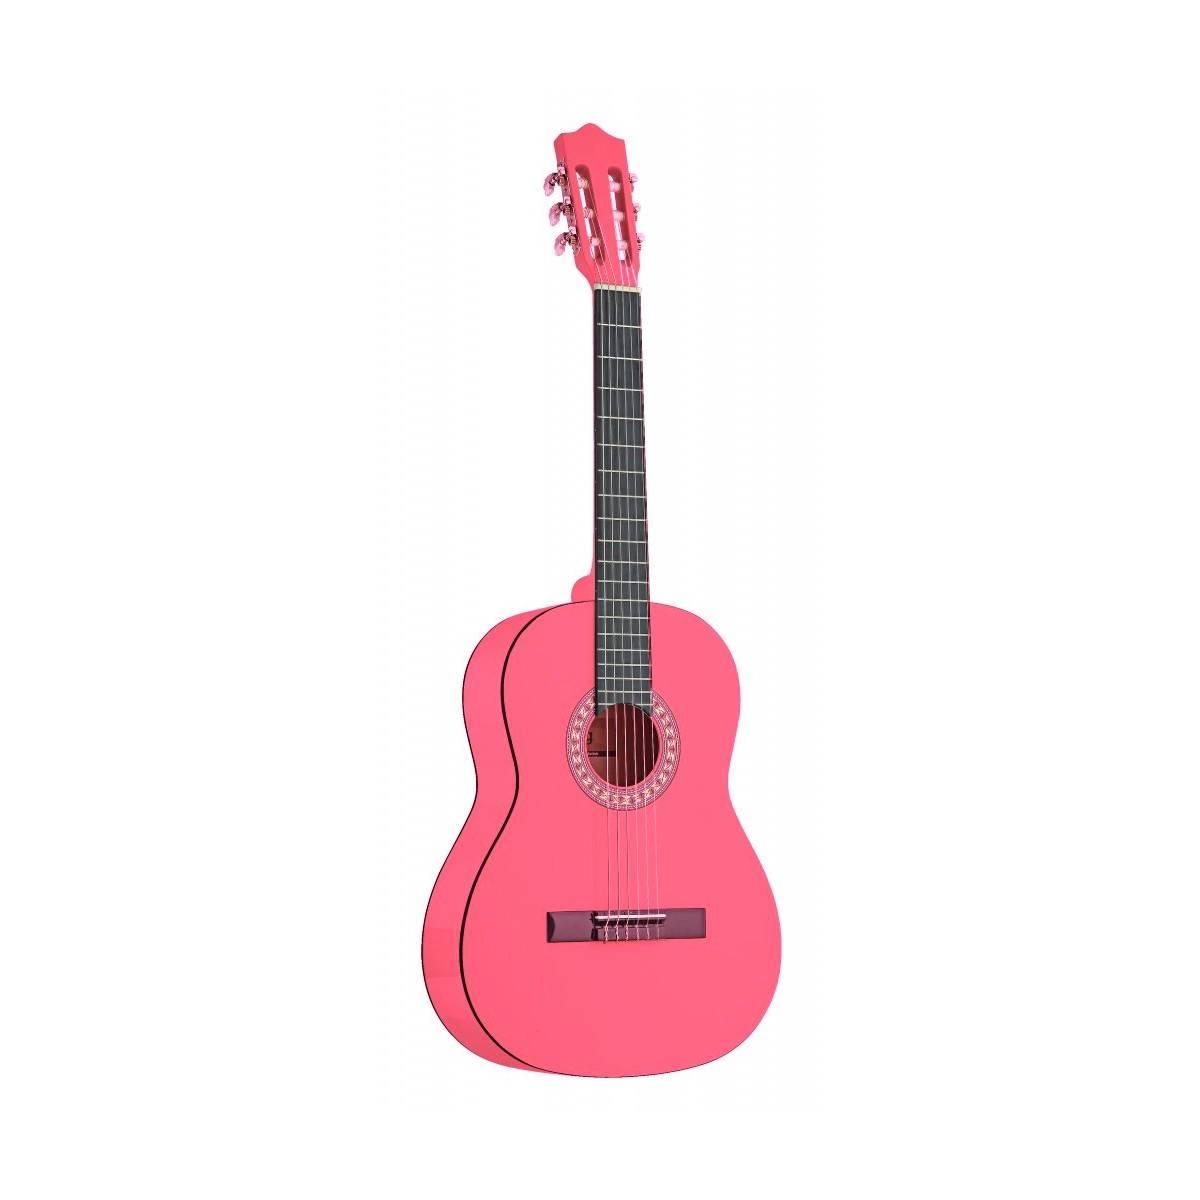 guitare classique enfant 3 4 c530 pk tilleul erable rose. Black Bedroom Furniture Sets. Home Design Ideas